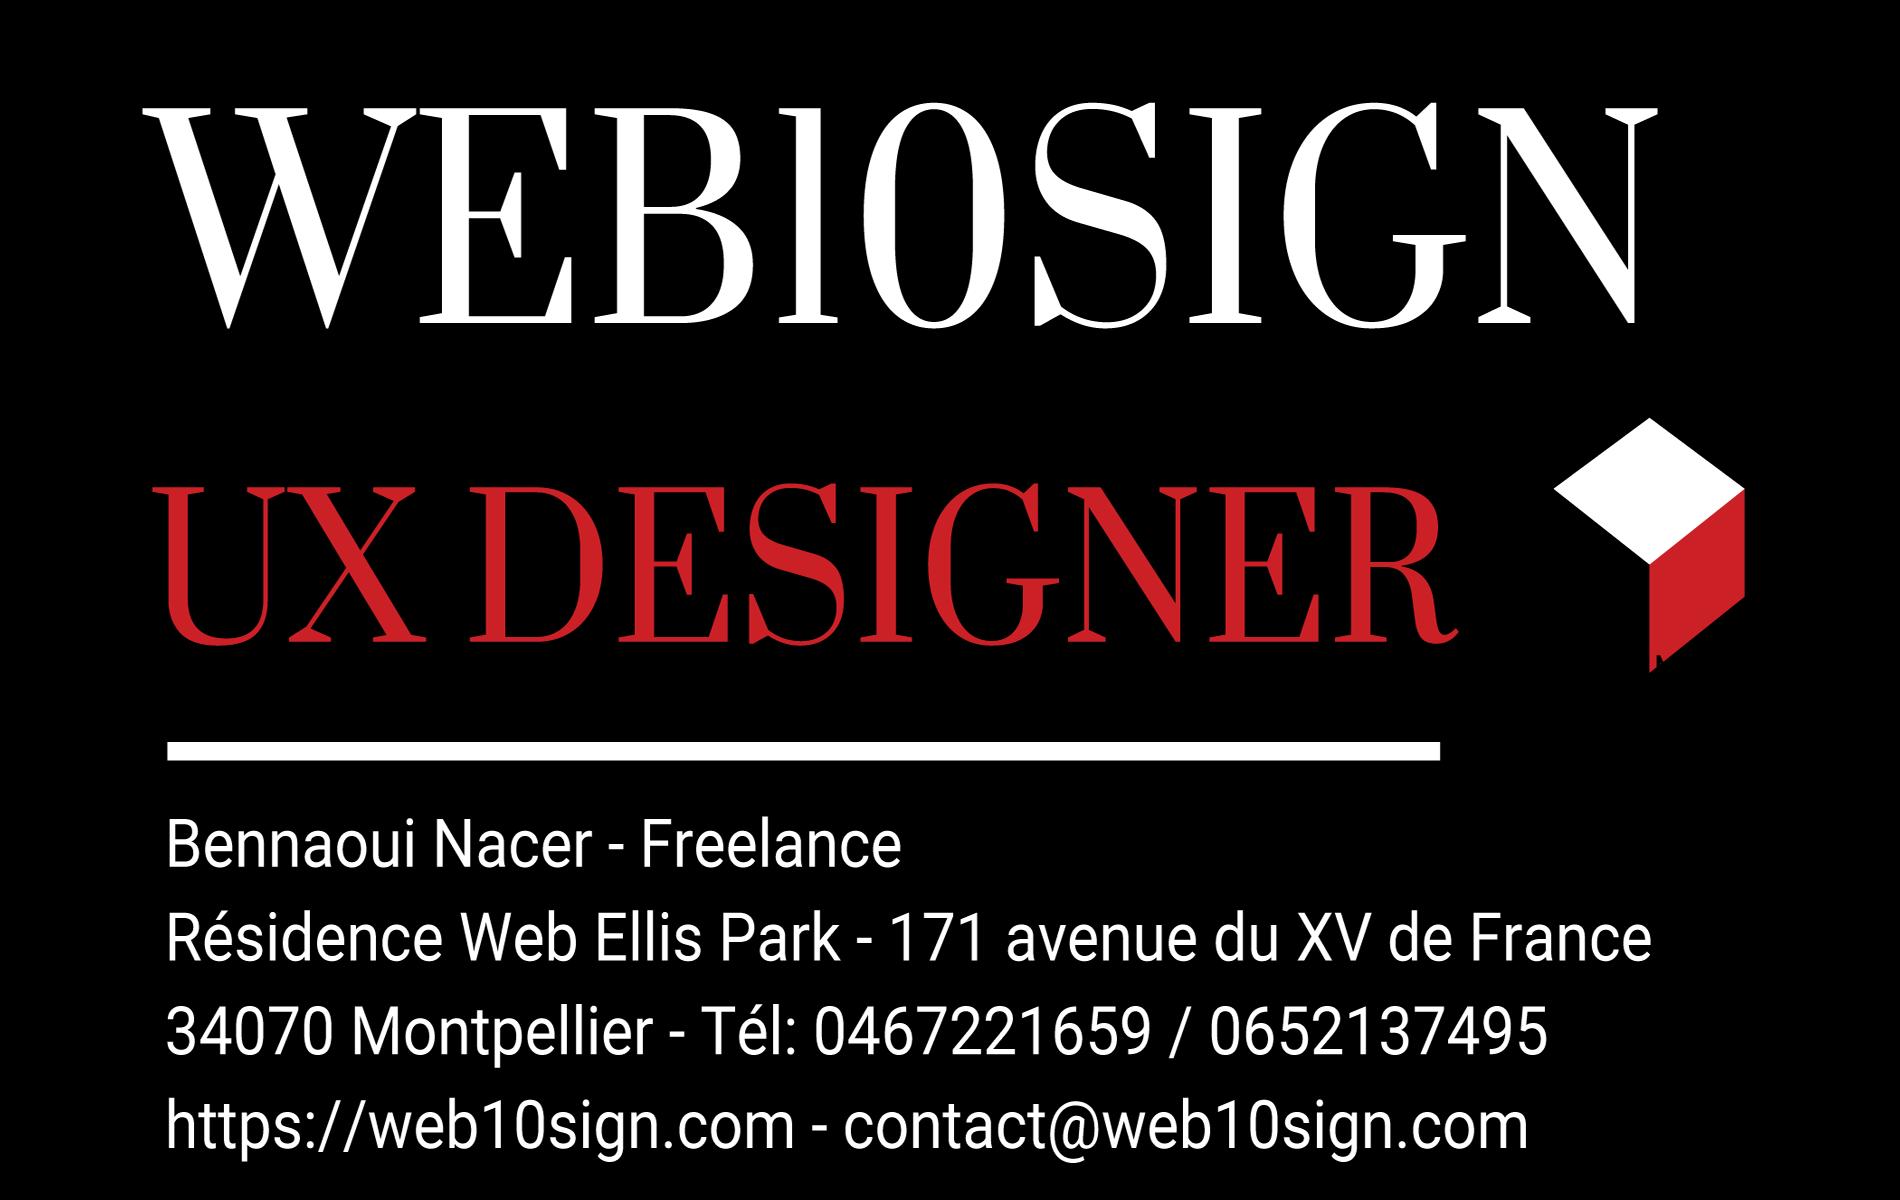 Carte de Visite Web10sign